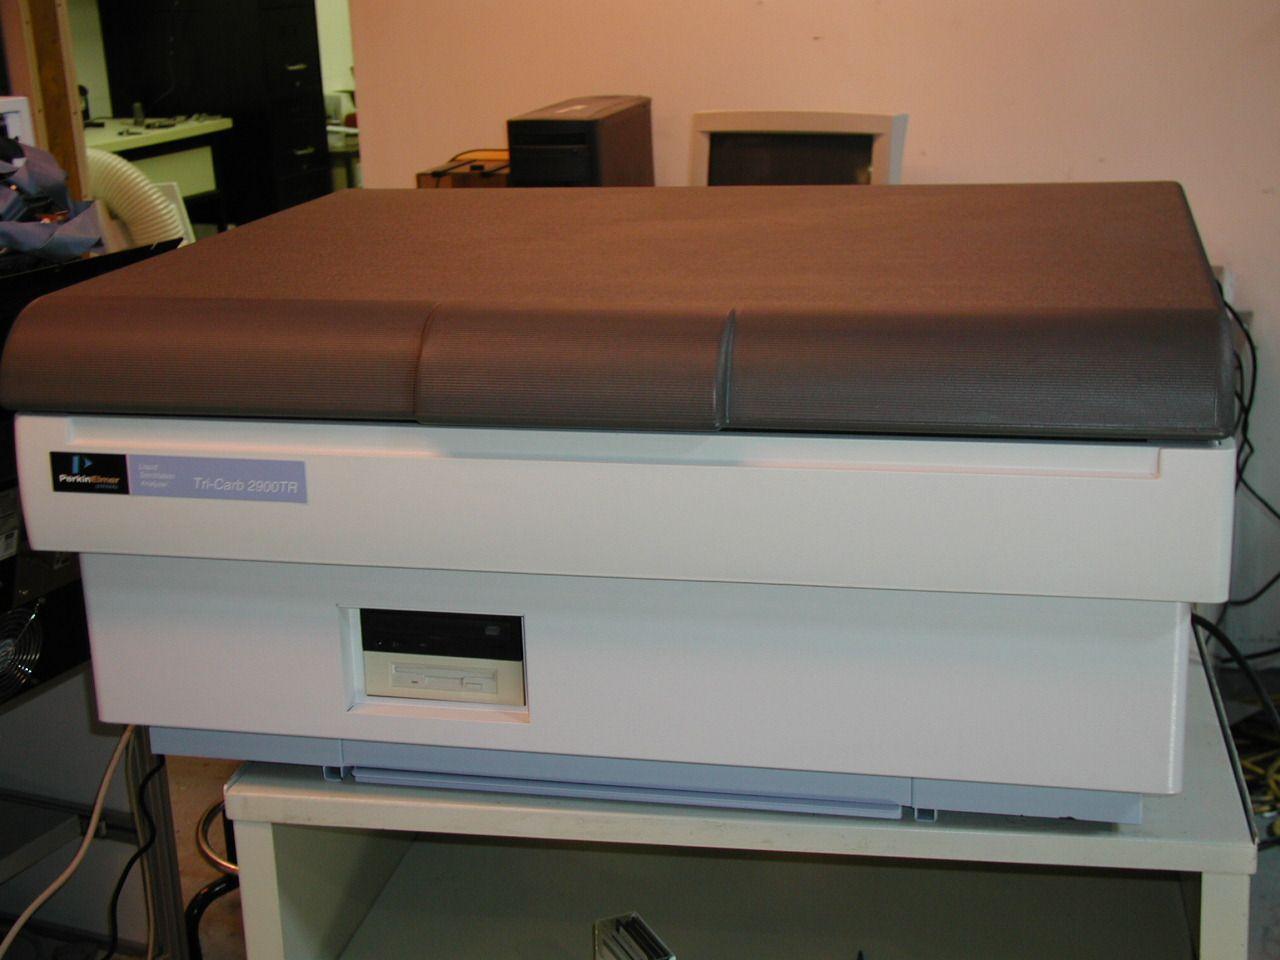 Perkin Elmer 2800TR TriCarb Liquid Scintillation Analyzer